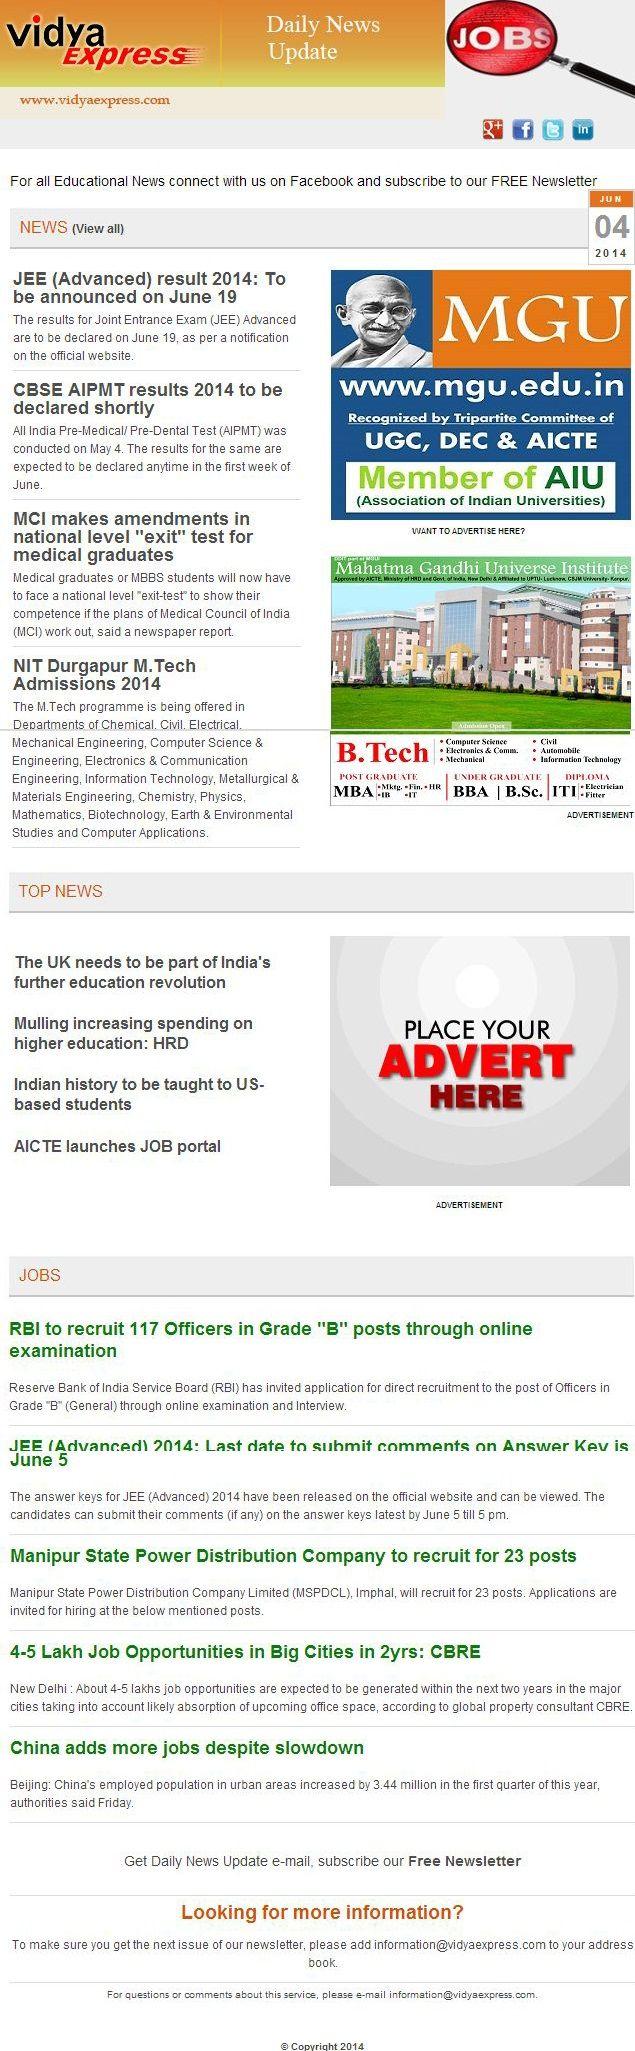 "#EducationNews@VidyaExpress-""CBSE AIPMT results 2014 to be declared shortly"" For more information visit online: http://www.vidyaexpress.com/newsletter/newsletter46/newslttr46.php"